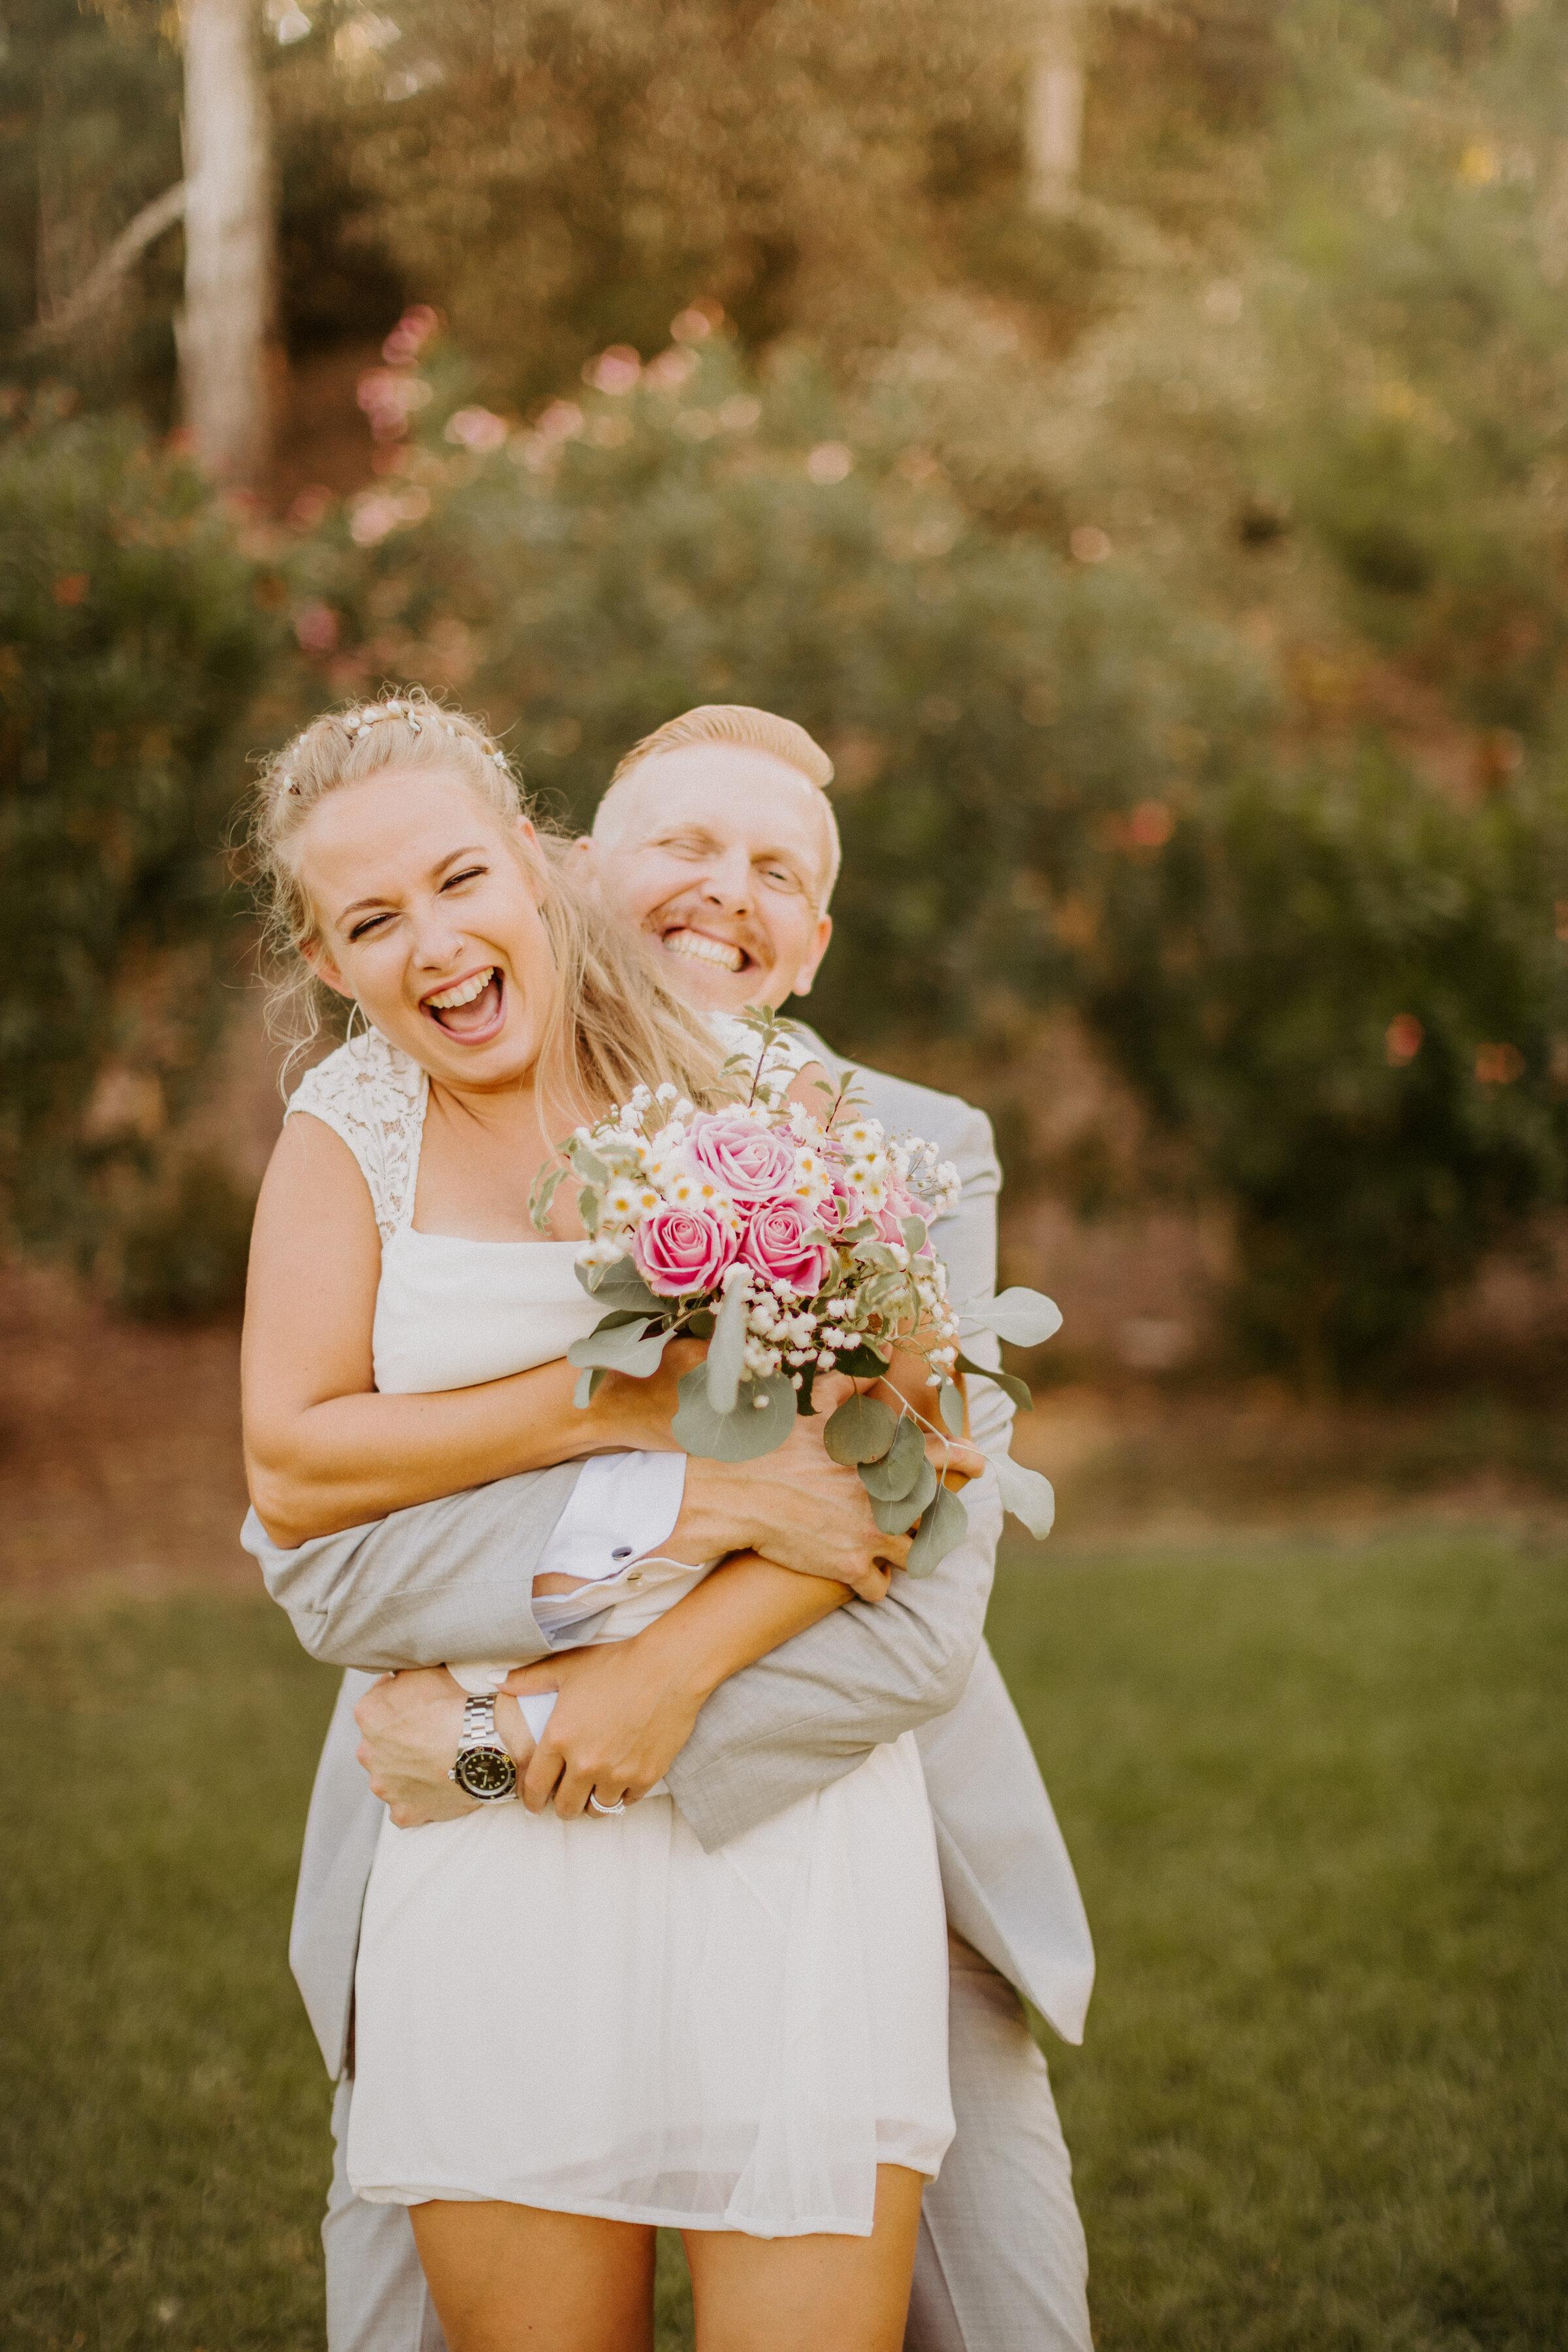 amphoto kj vowel renewal bridals-198.jpg